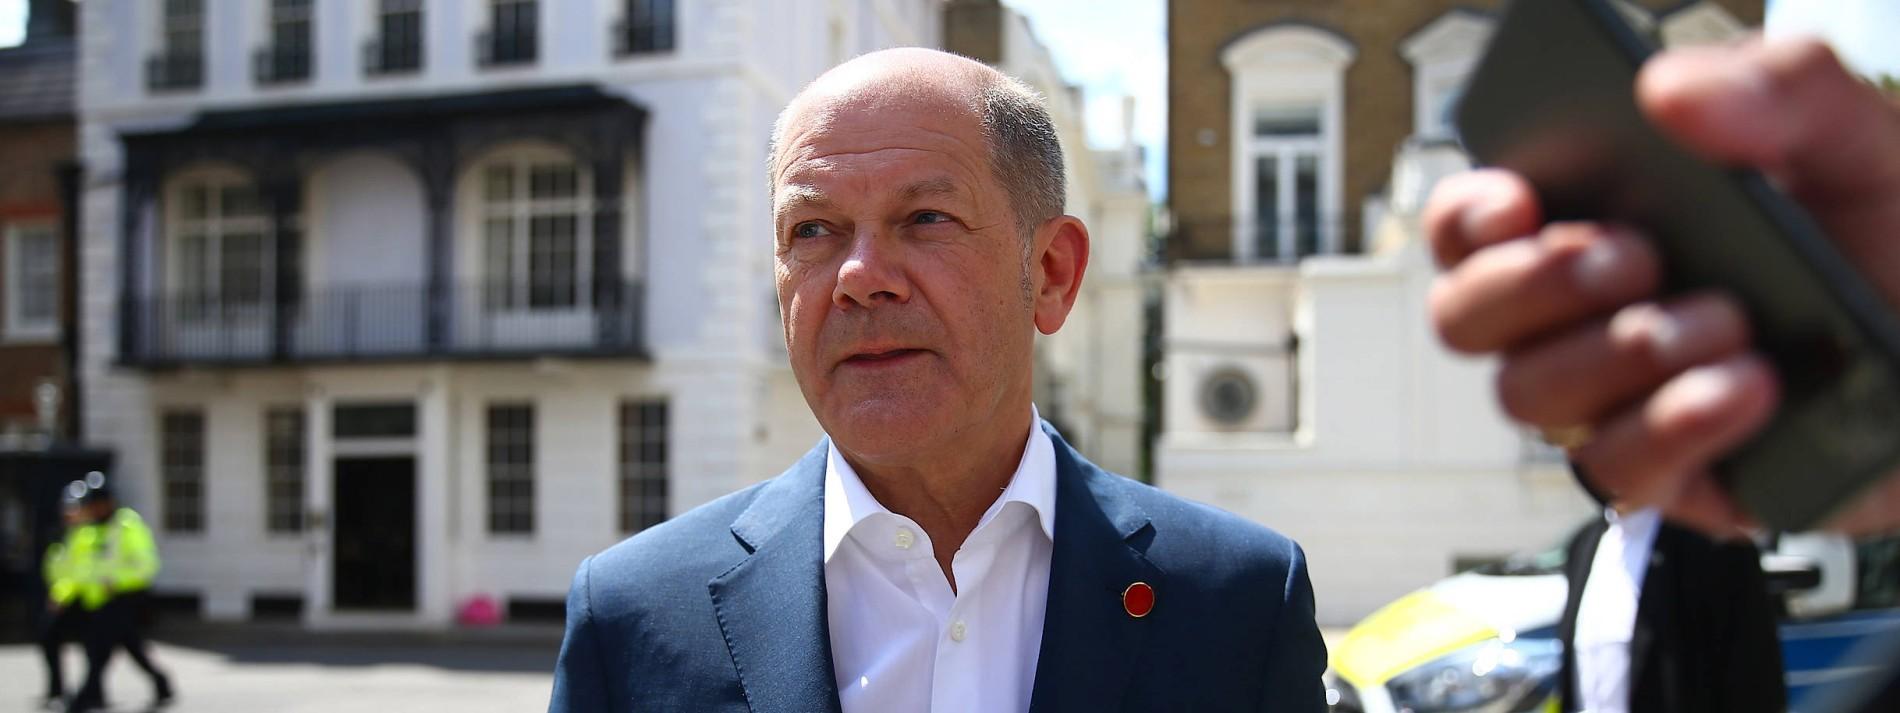 Olaf Scholz läge bei Kanzler-Direktwahl vorn